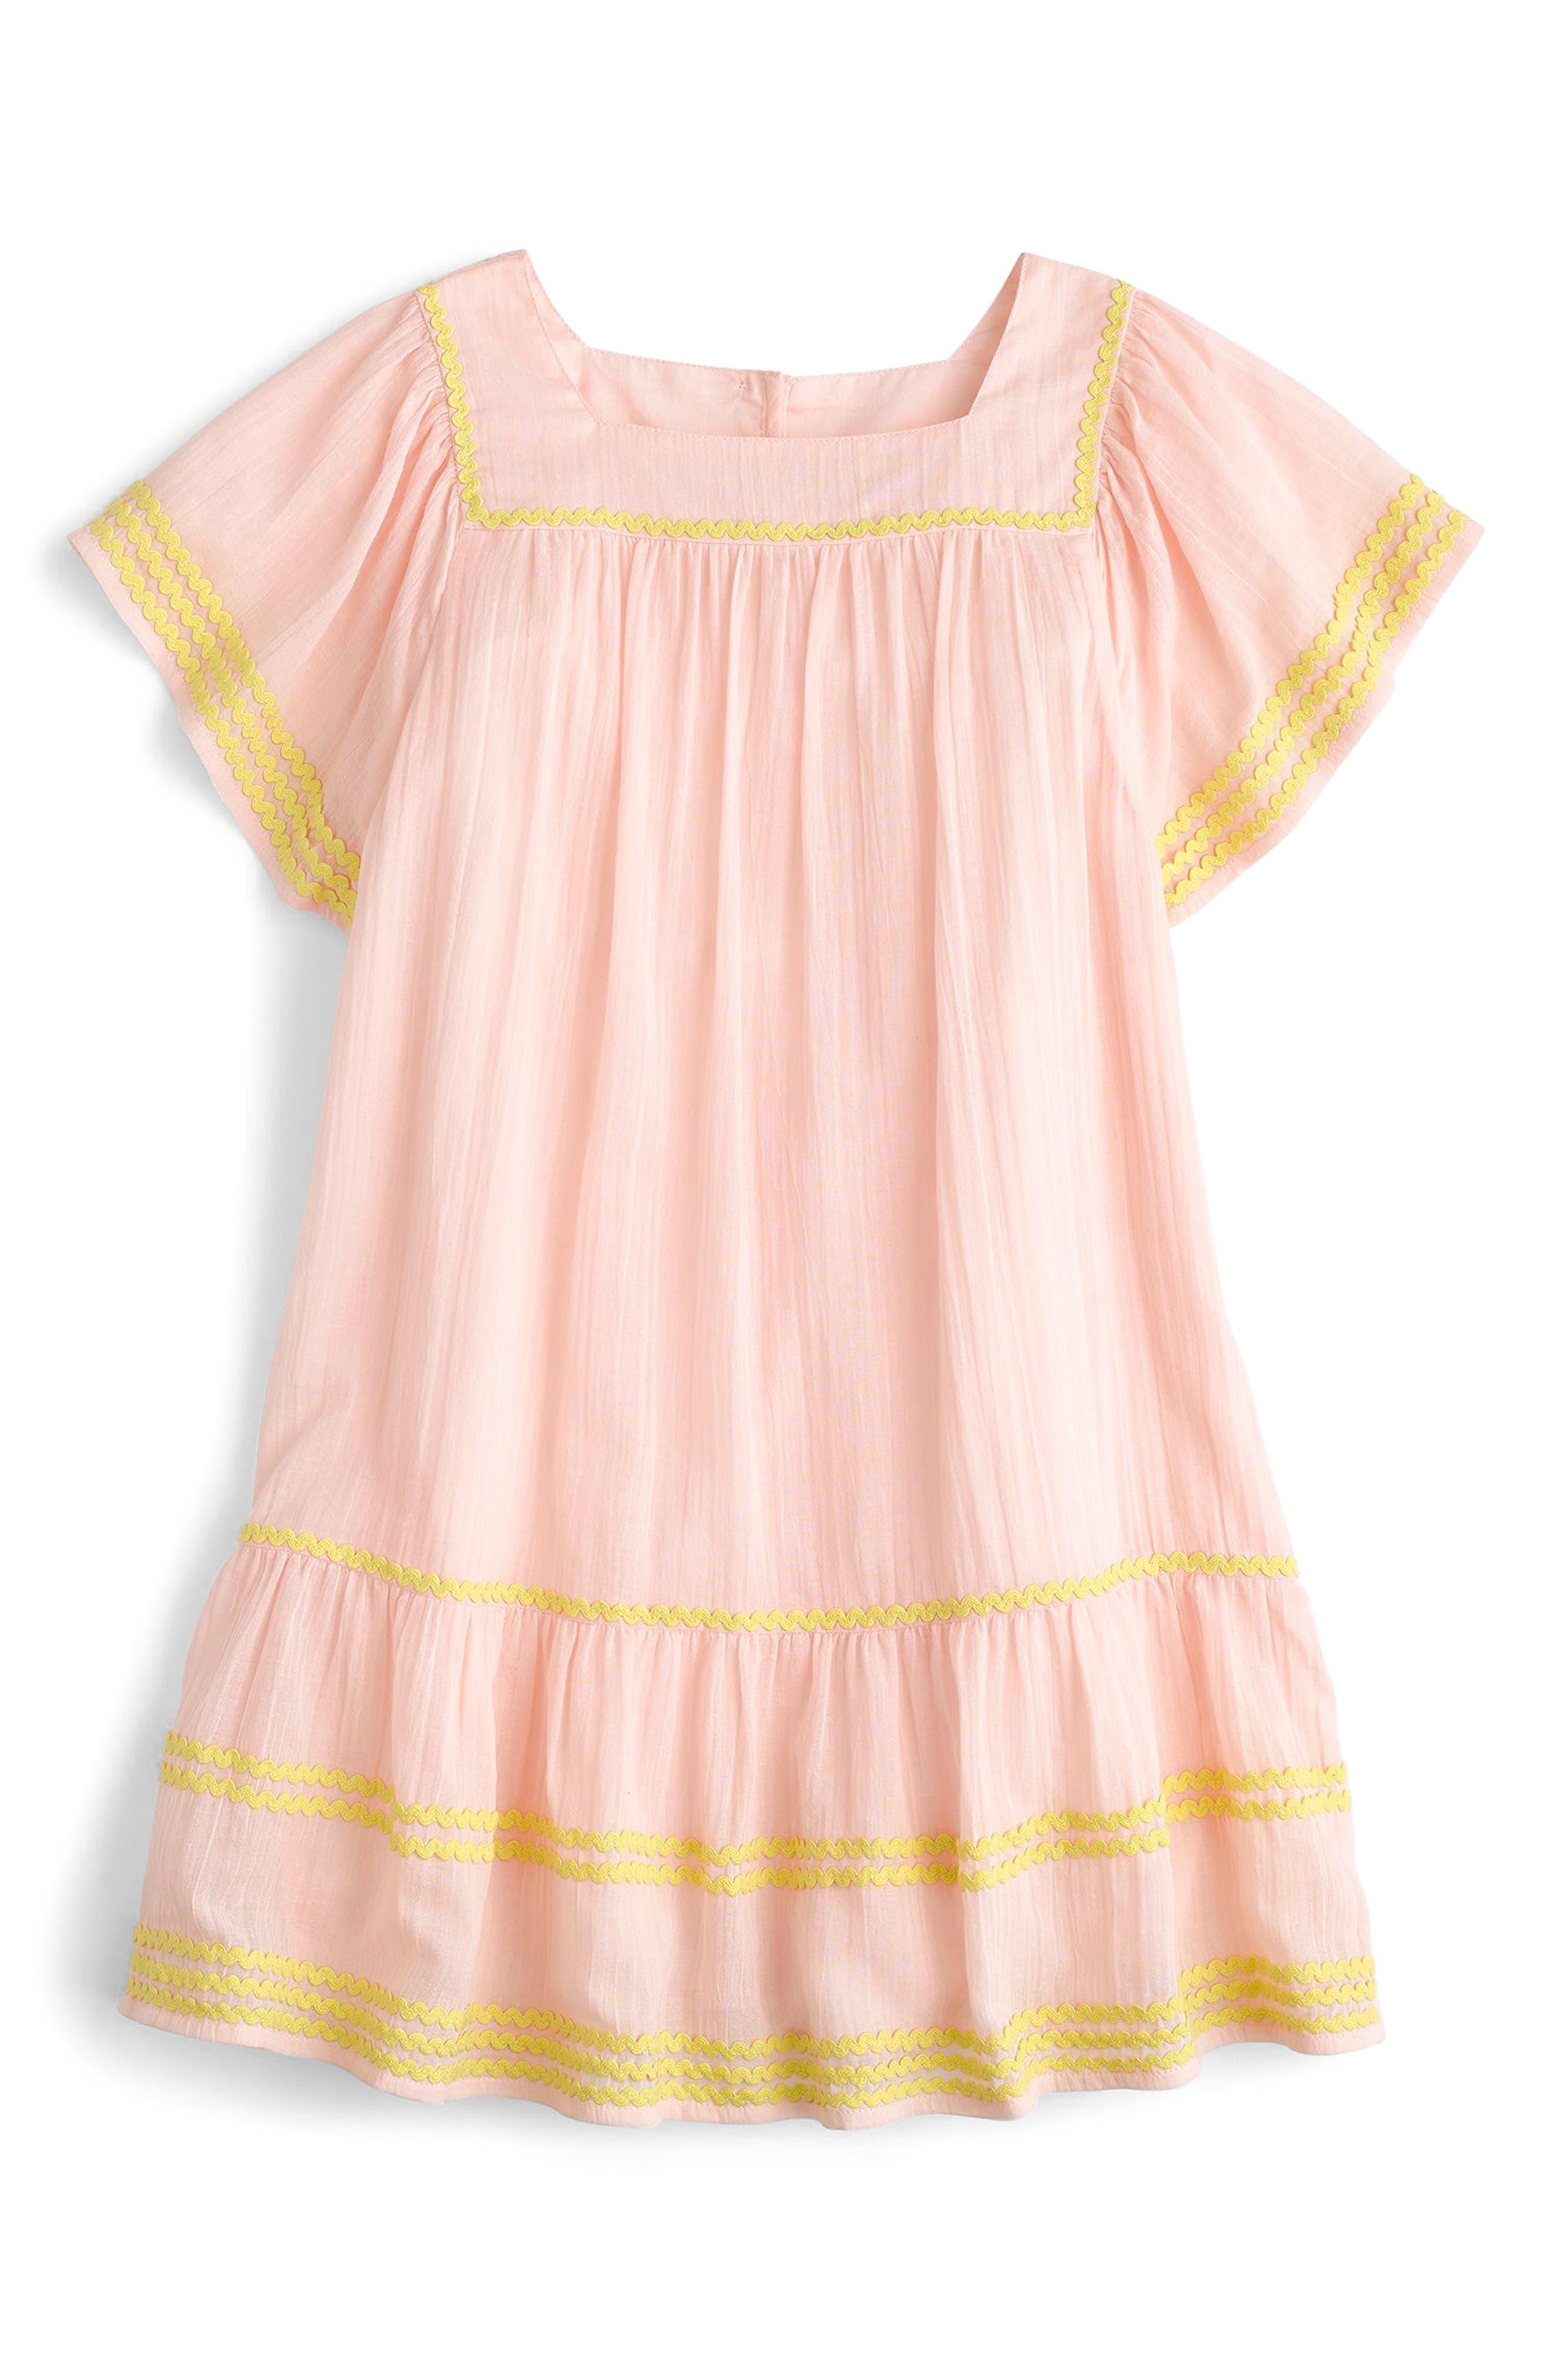 Bardot Cotton Dress,                         Main,                         color, Sunwashed Pink